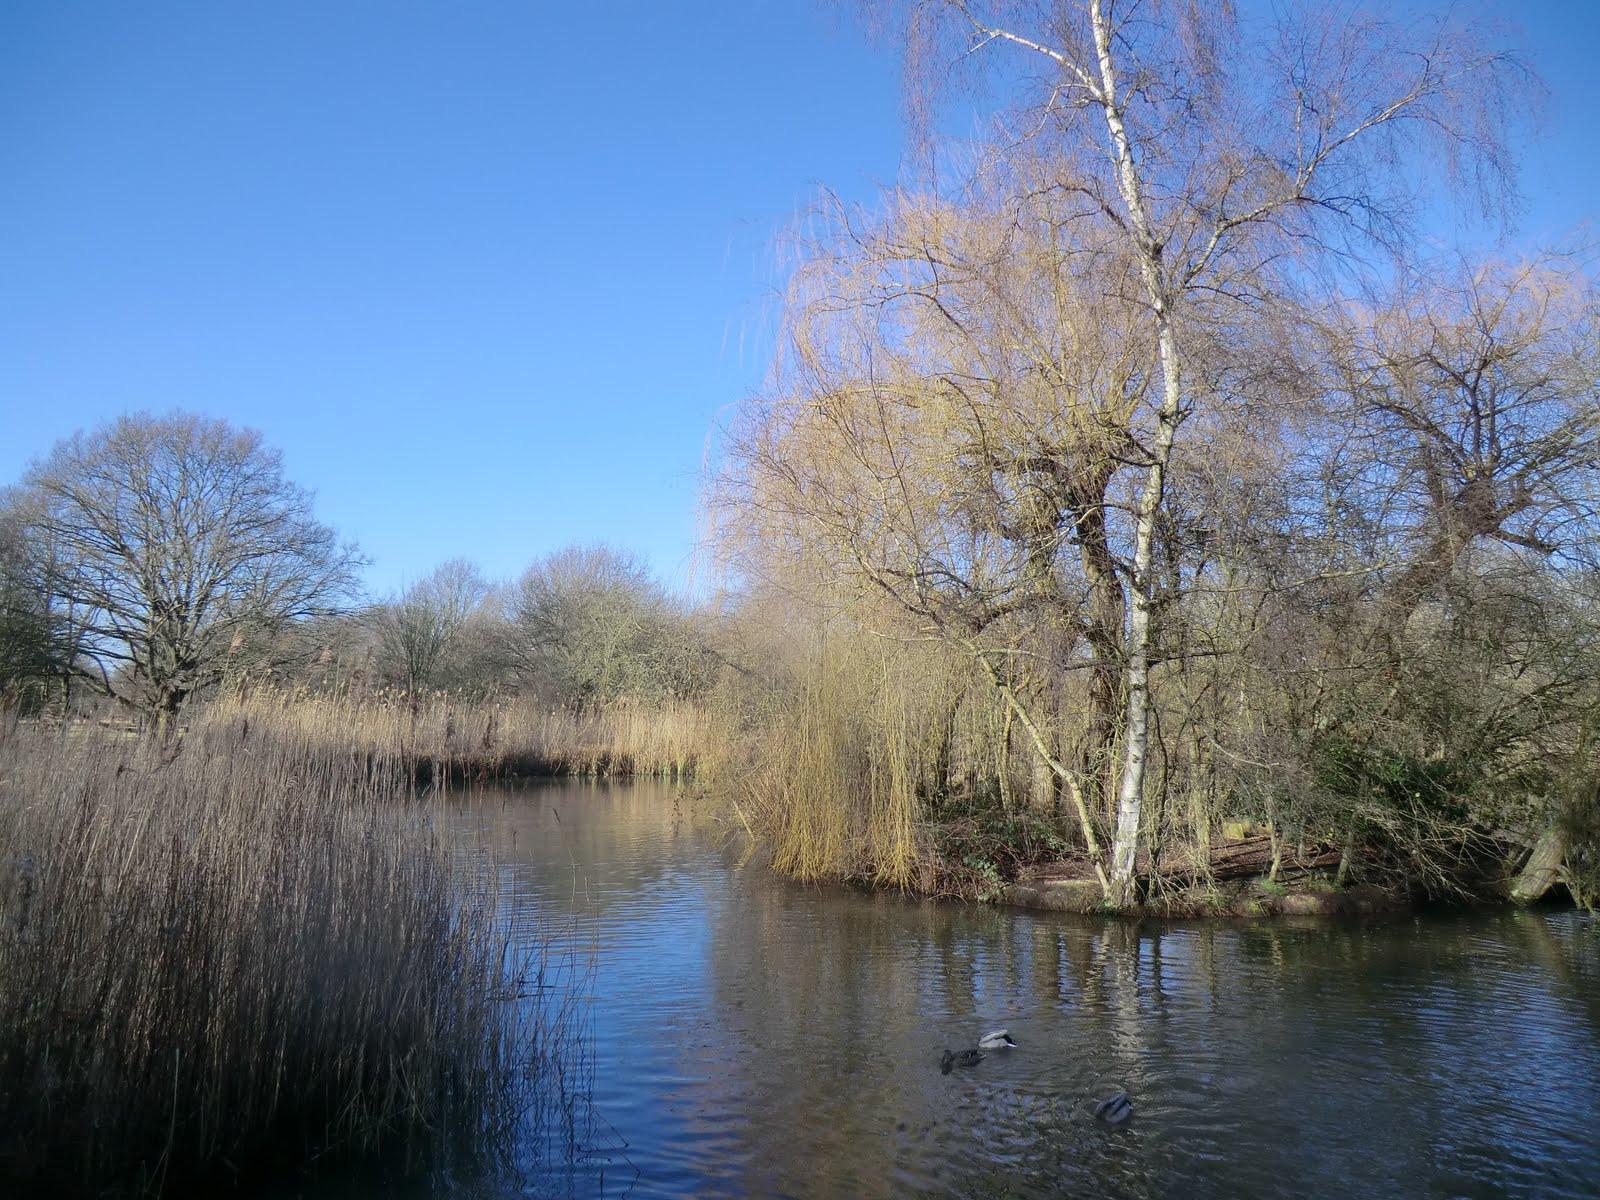 CIMG2450 Peg's Pond, Isabella Plantation